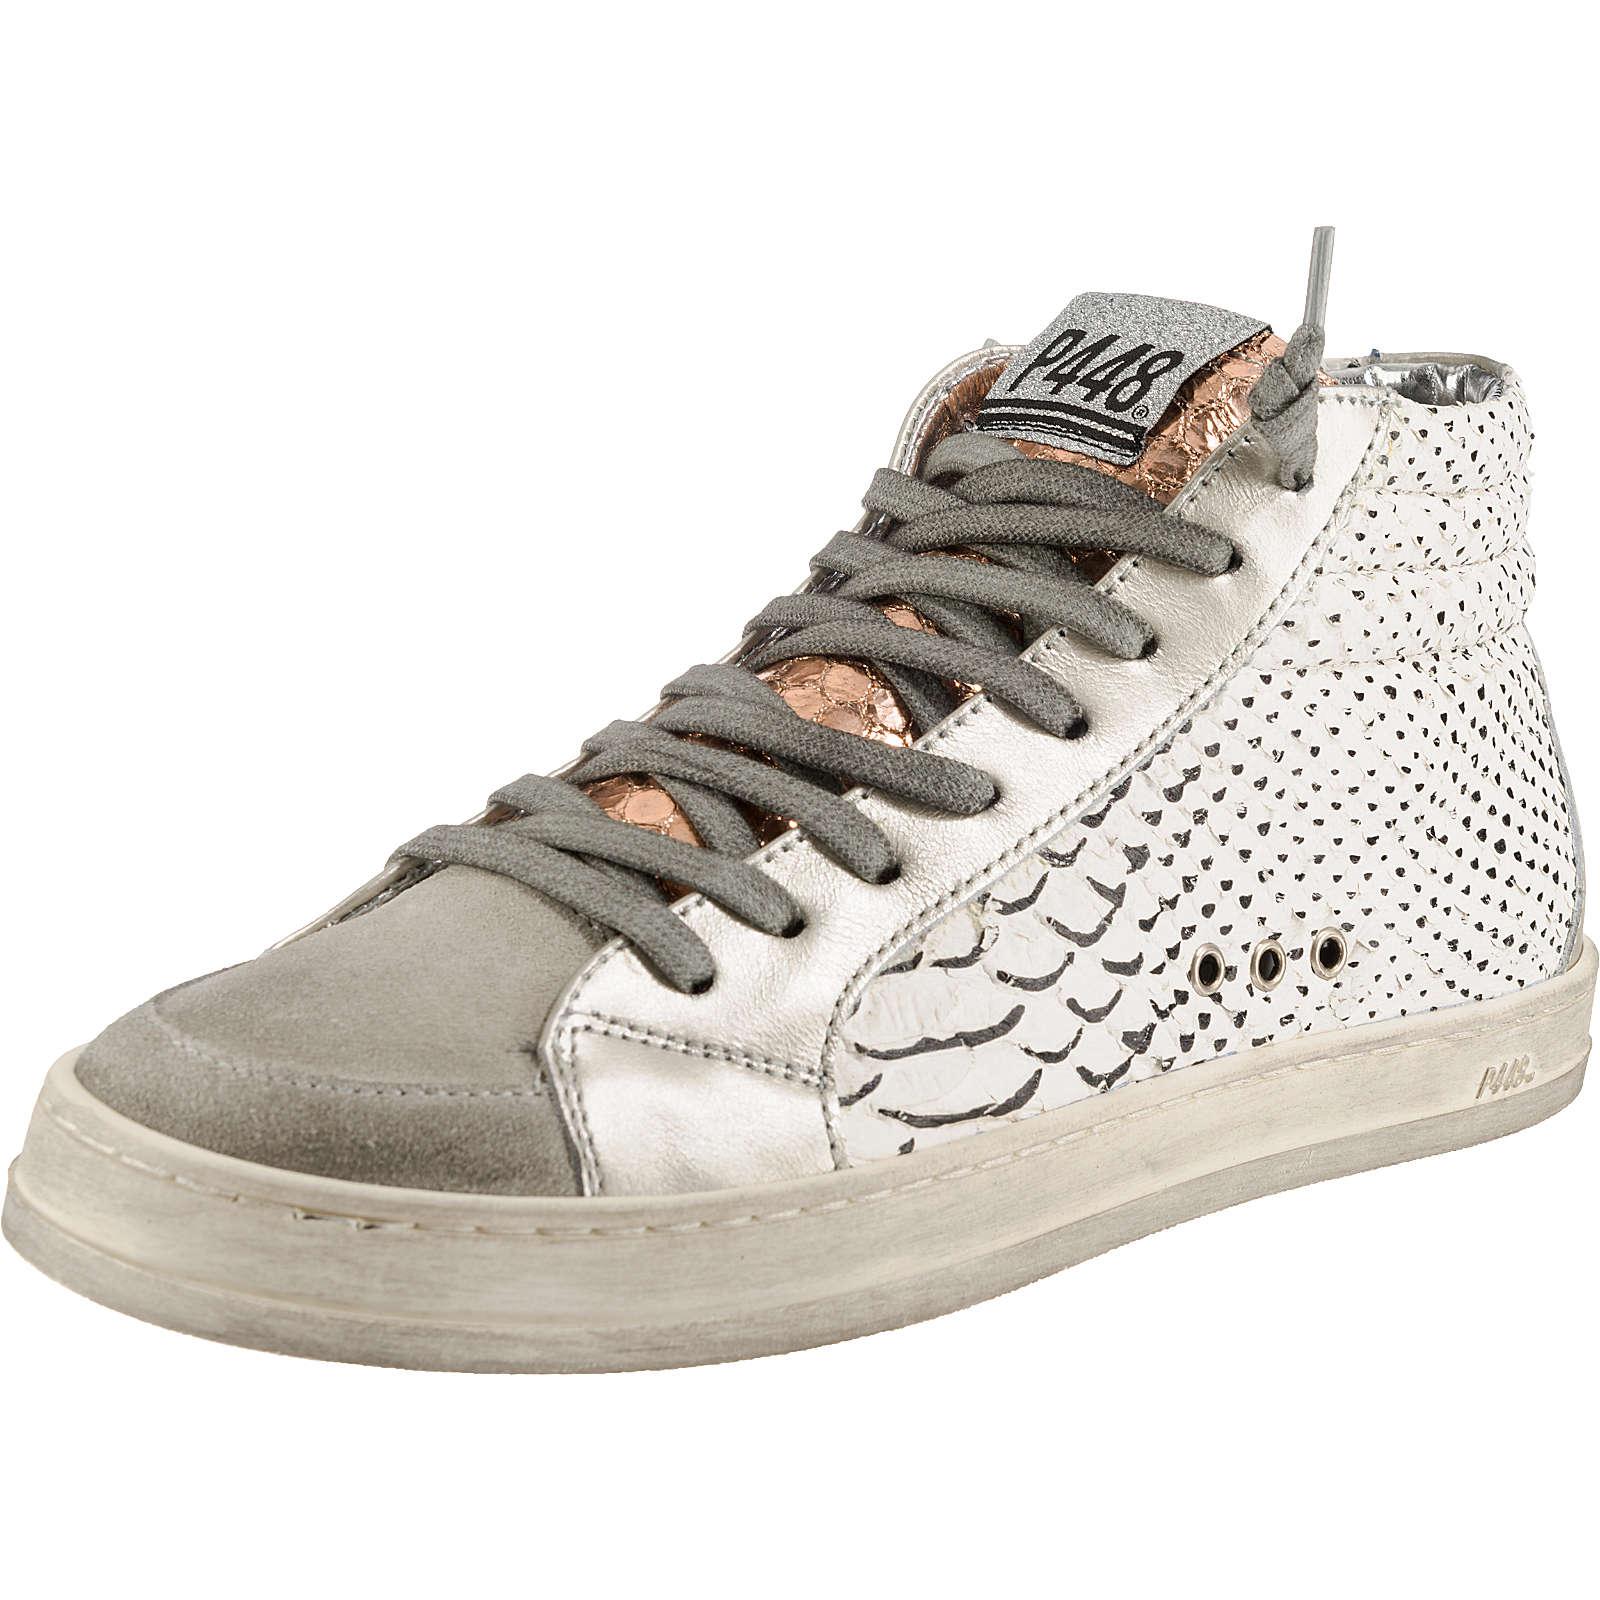 P448 Sneakers High weiß-kombi Damen Gr. 41